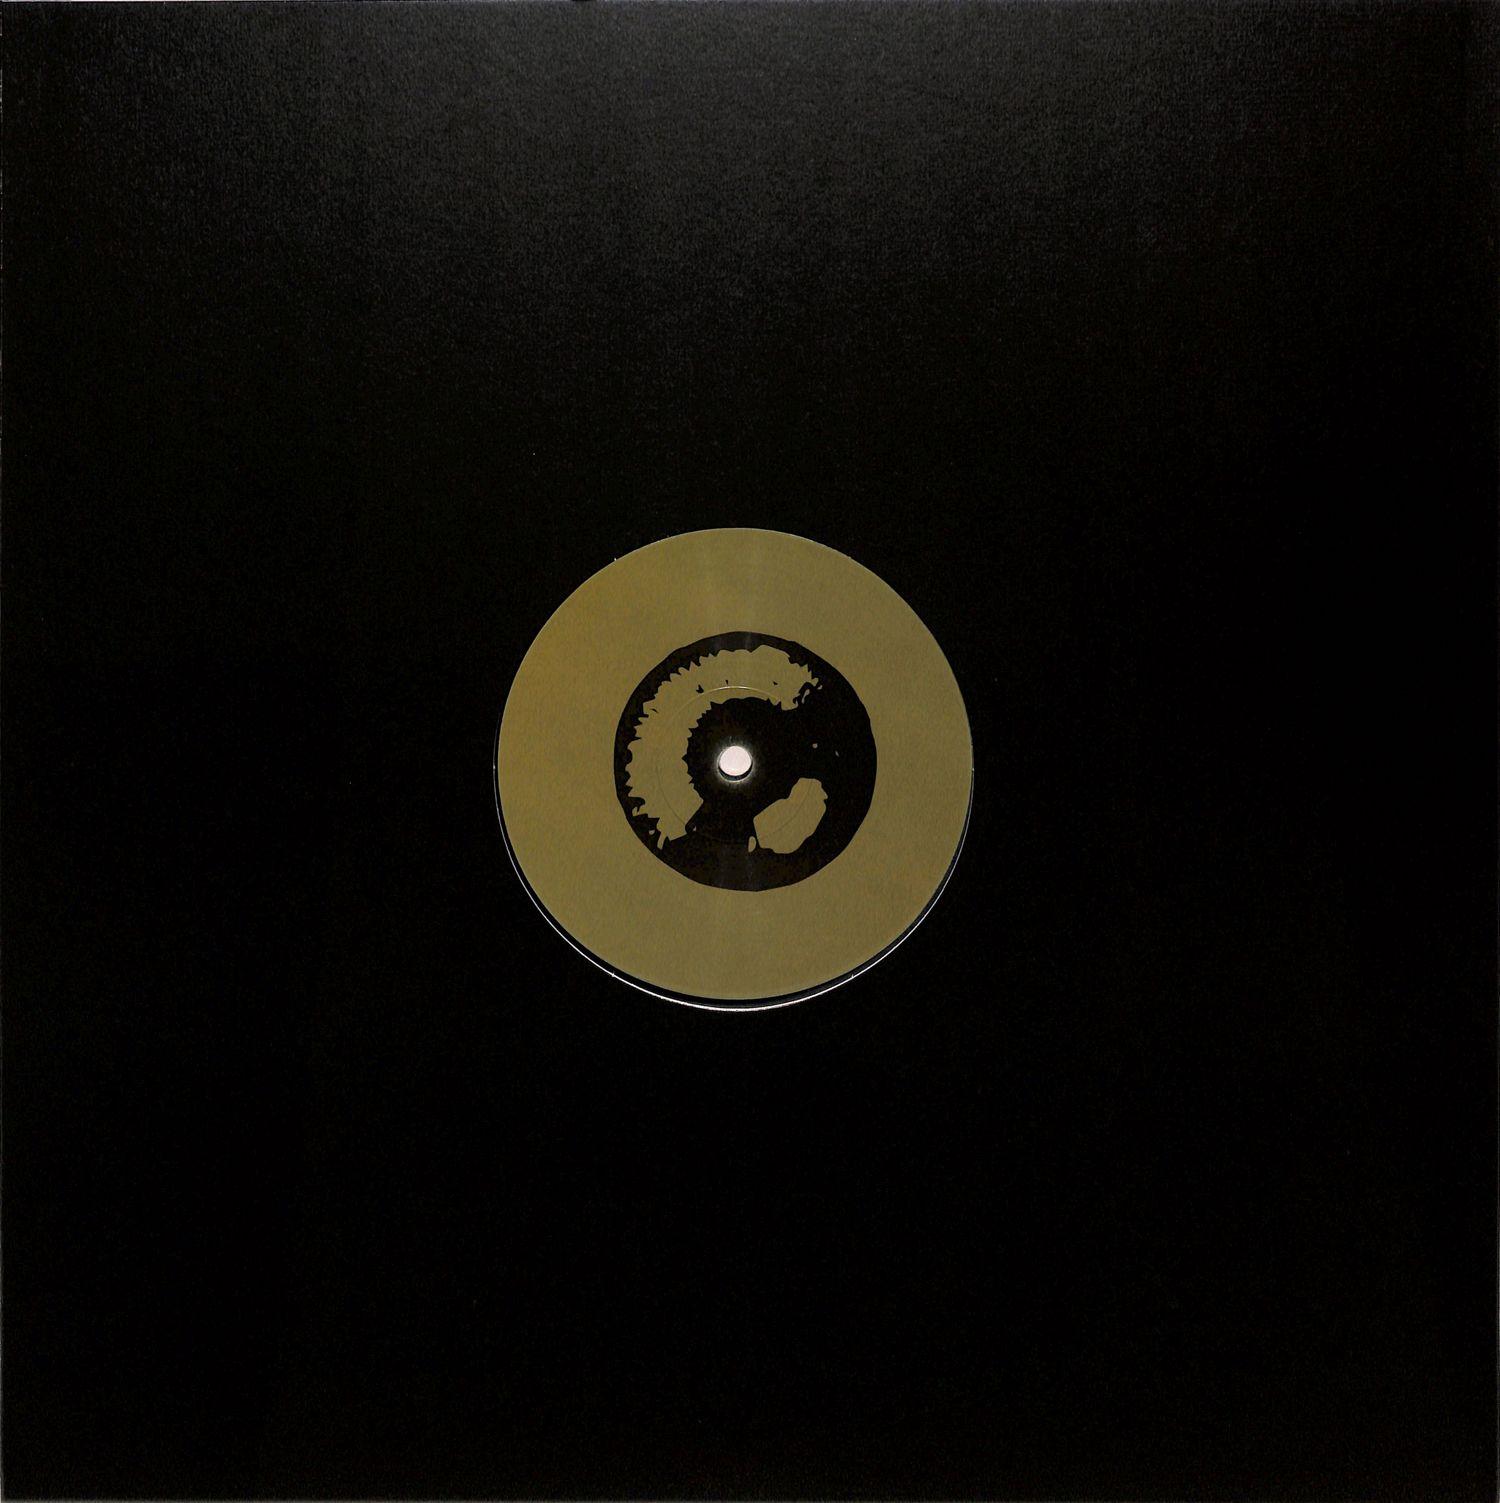 DJ W!ld & Lost.act - DAILYCID012